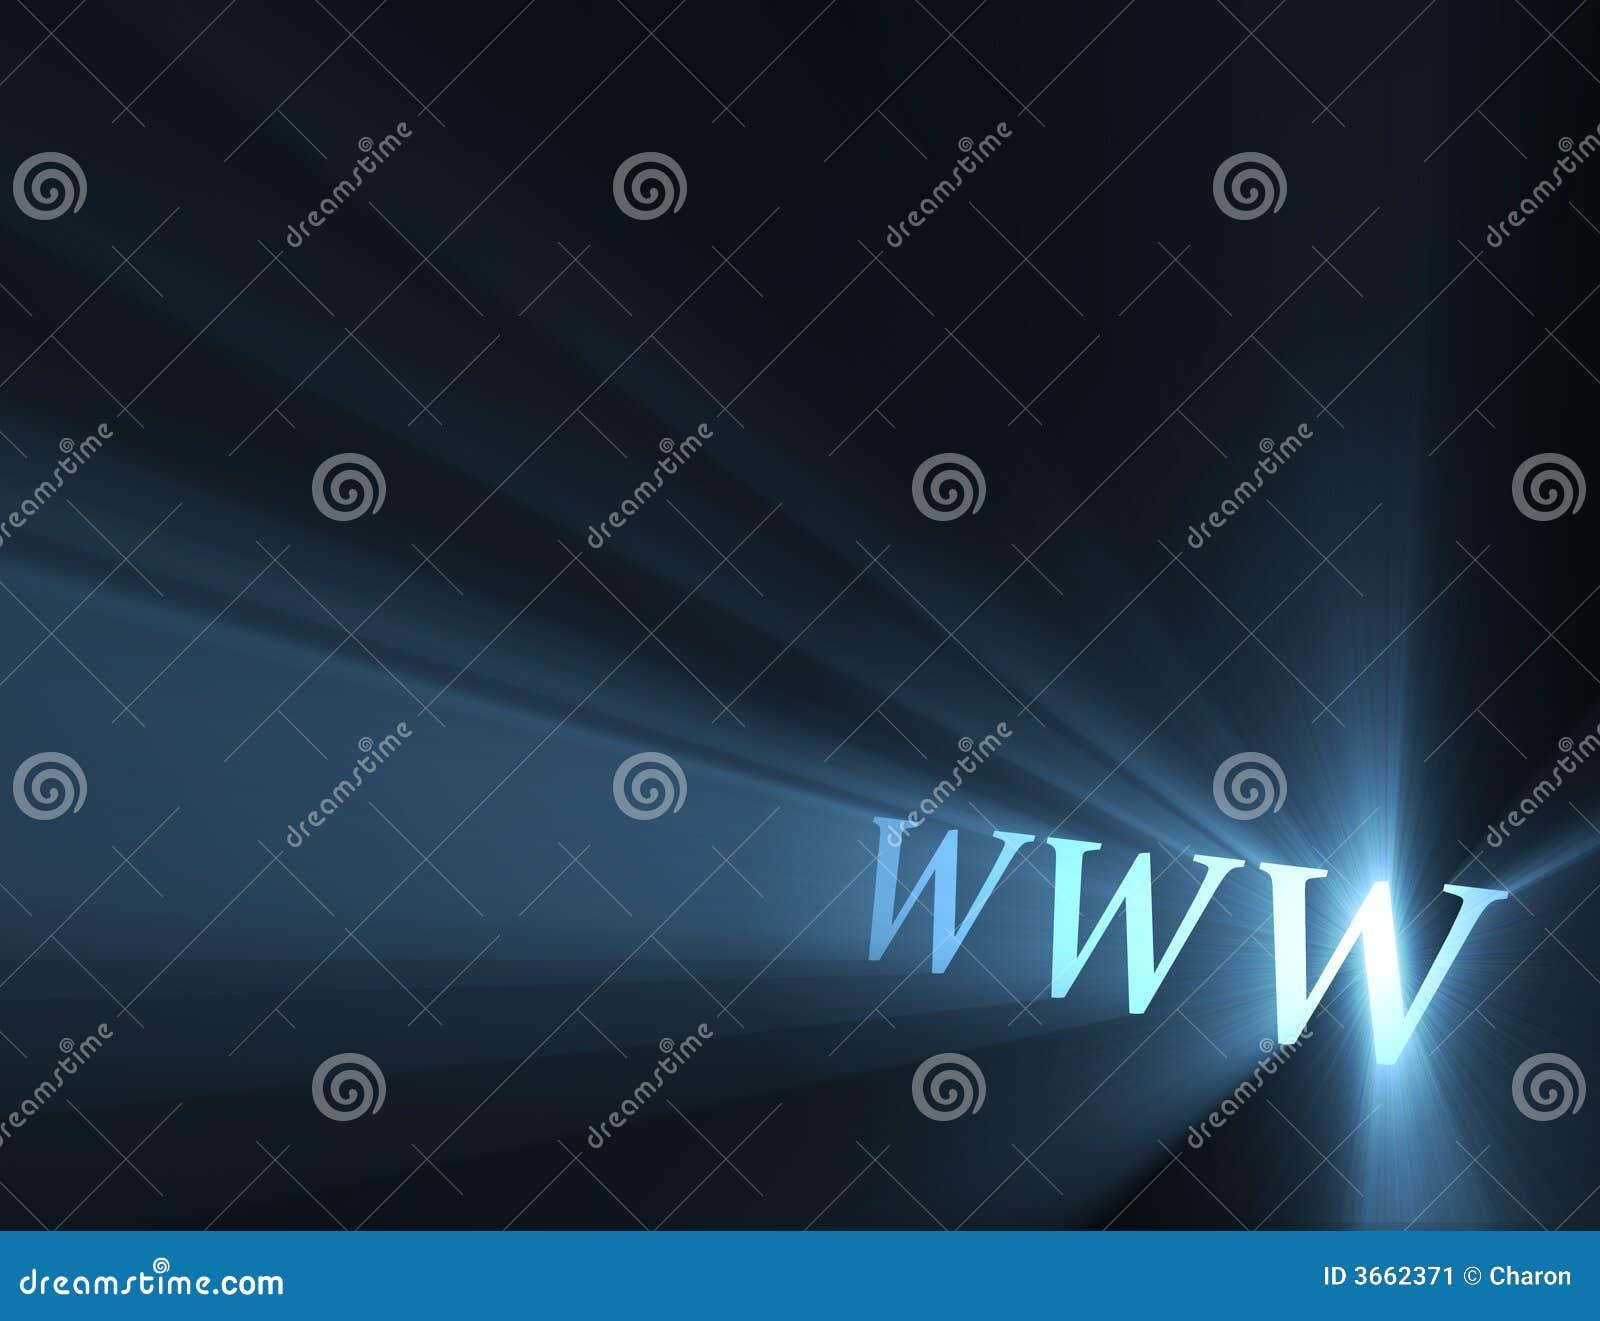 World- Wide Webwww-Leuchteaufflackern